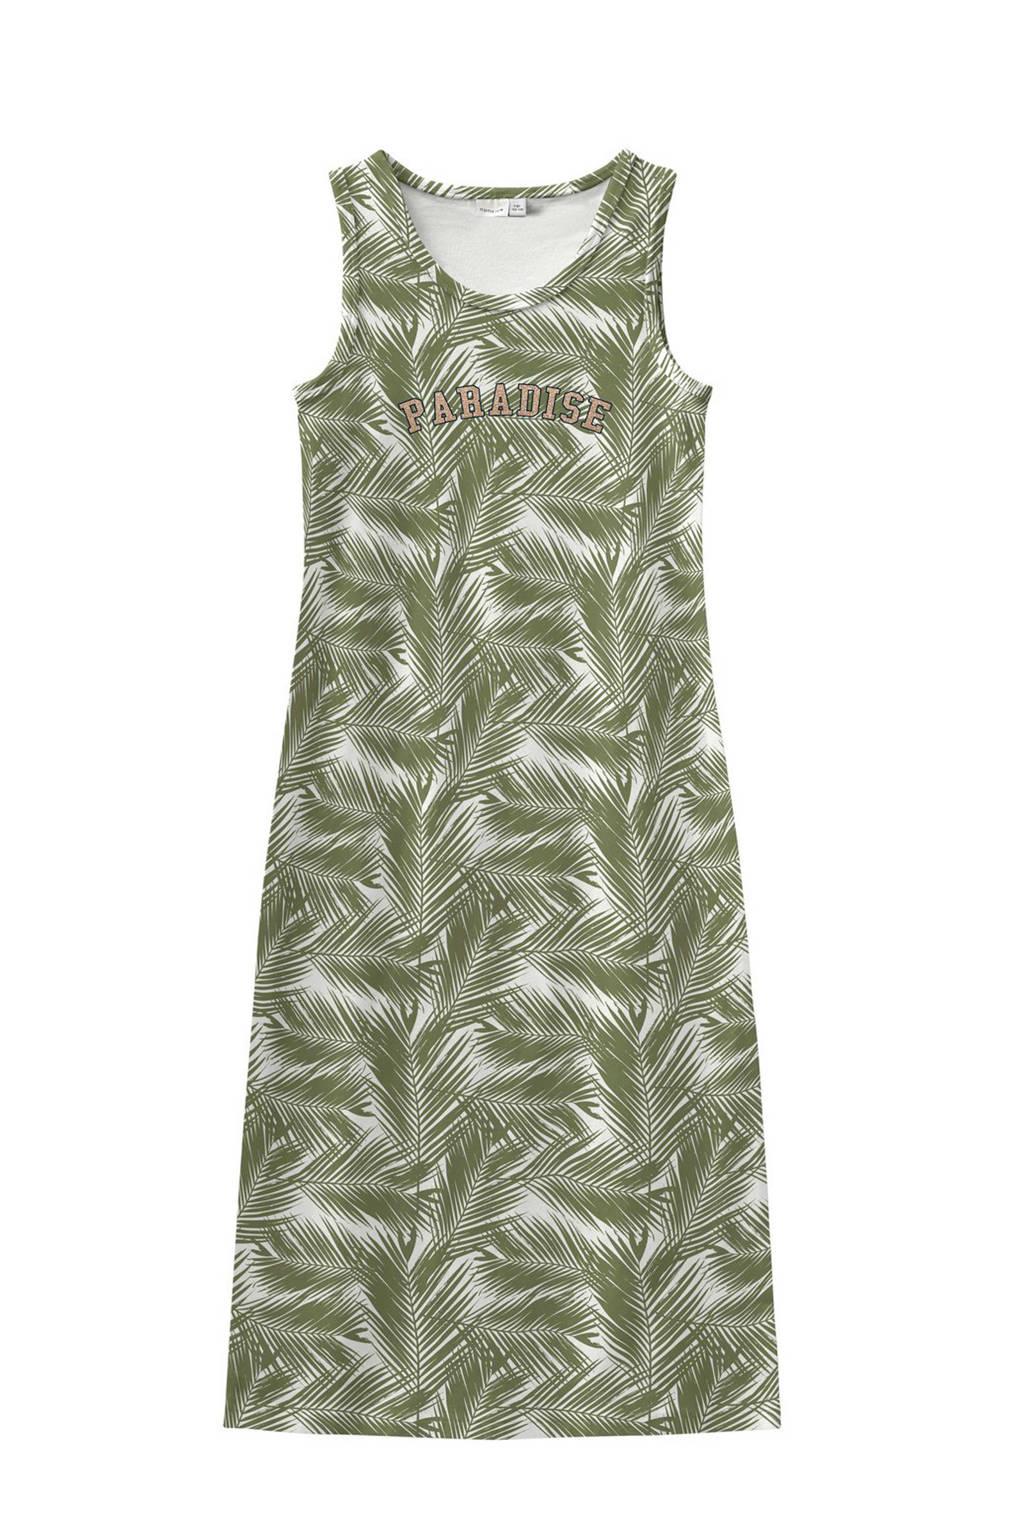 NAME IT KIDS maxi jurk met all over print groen, Groen